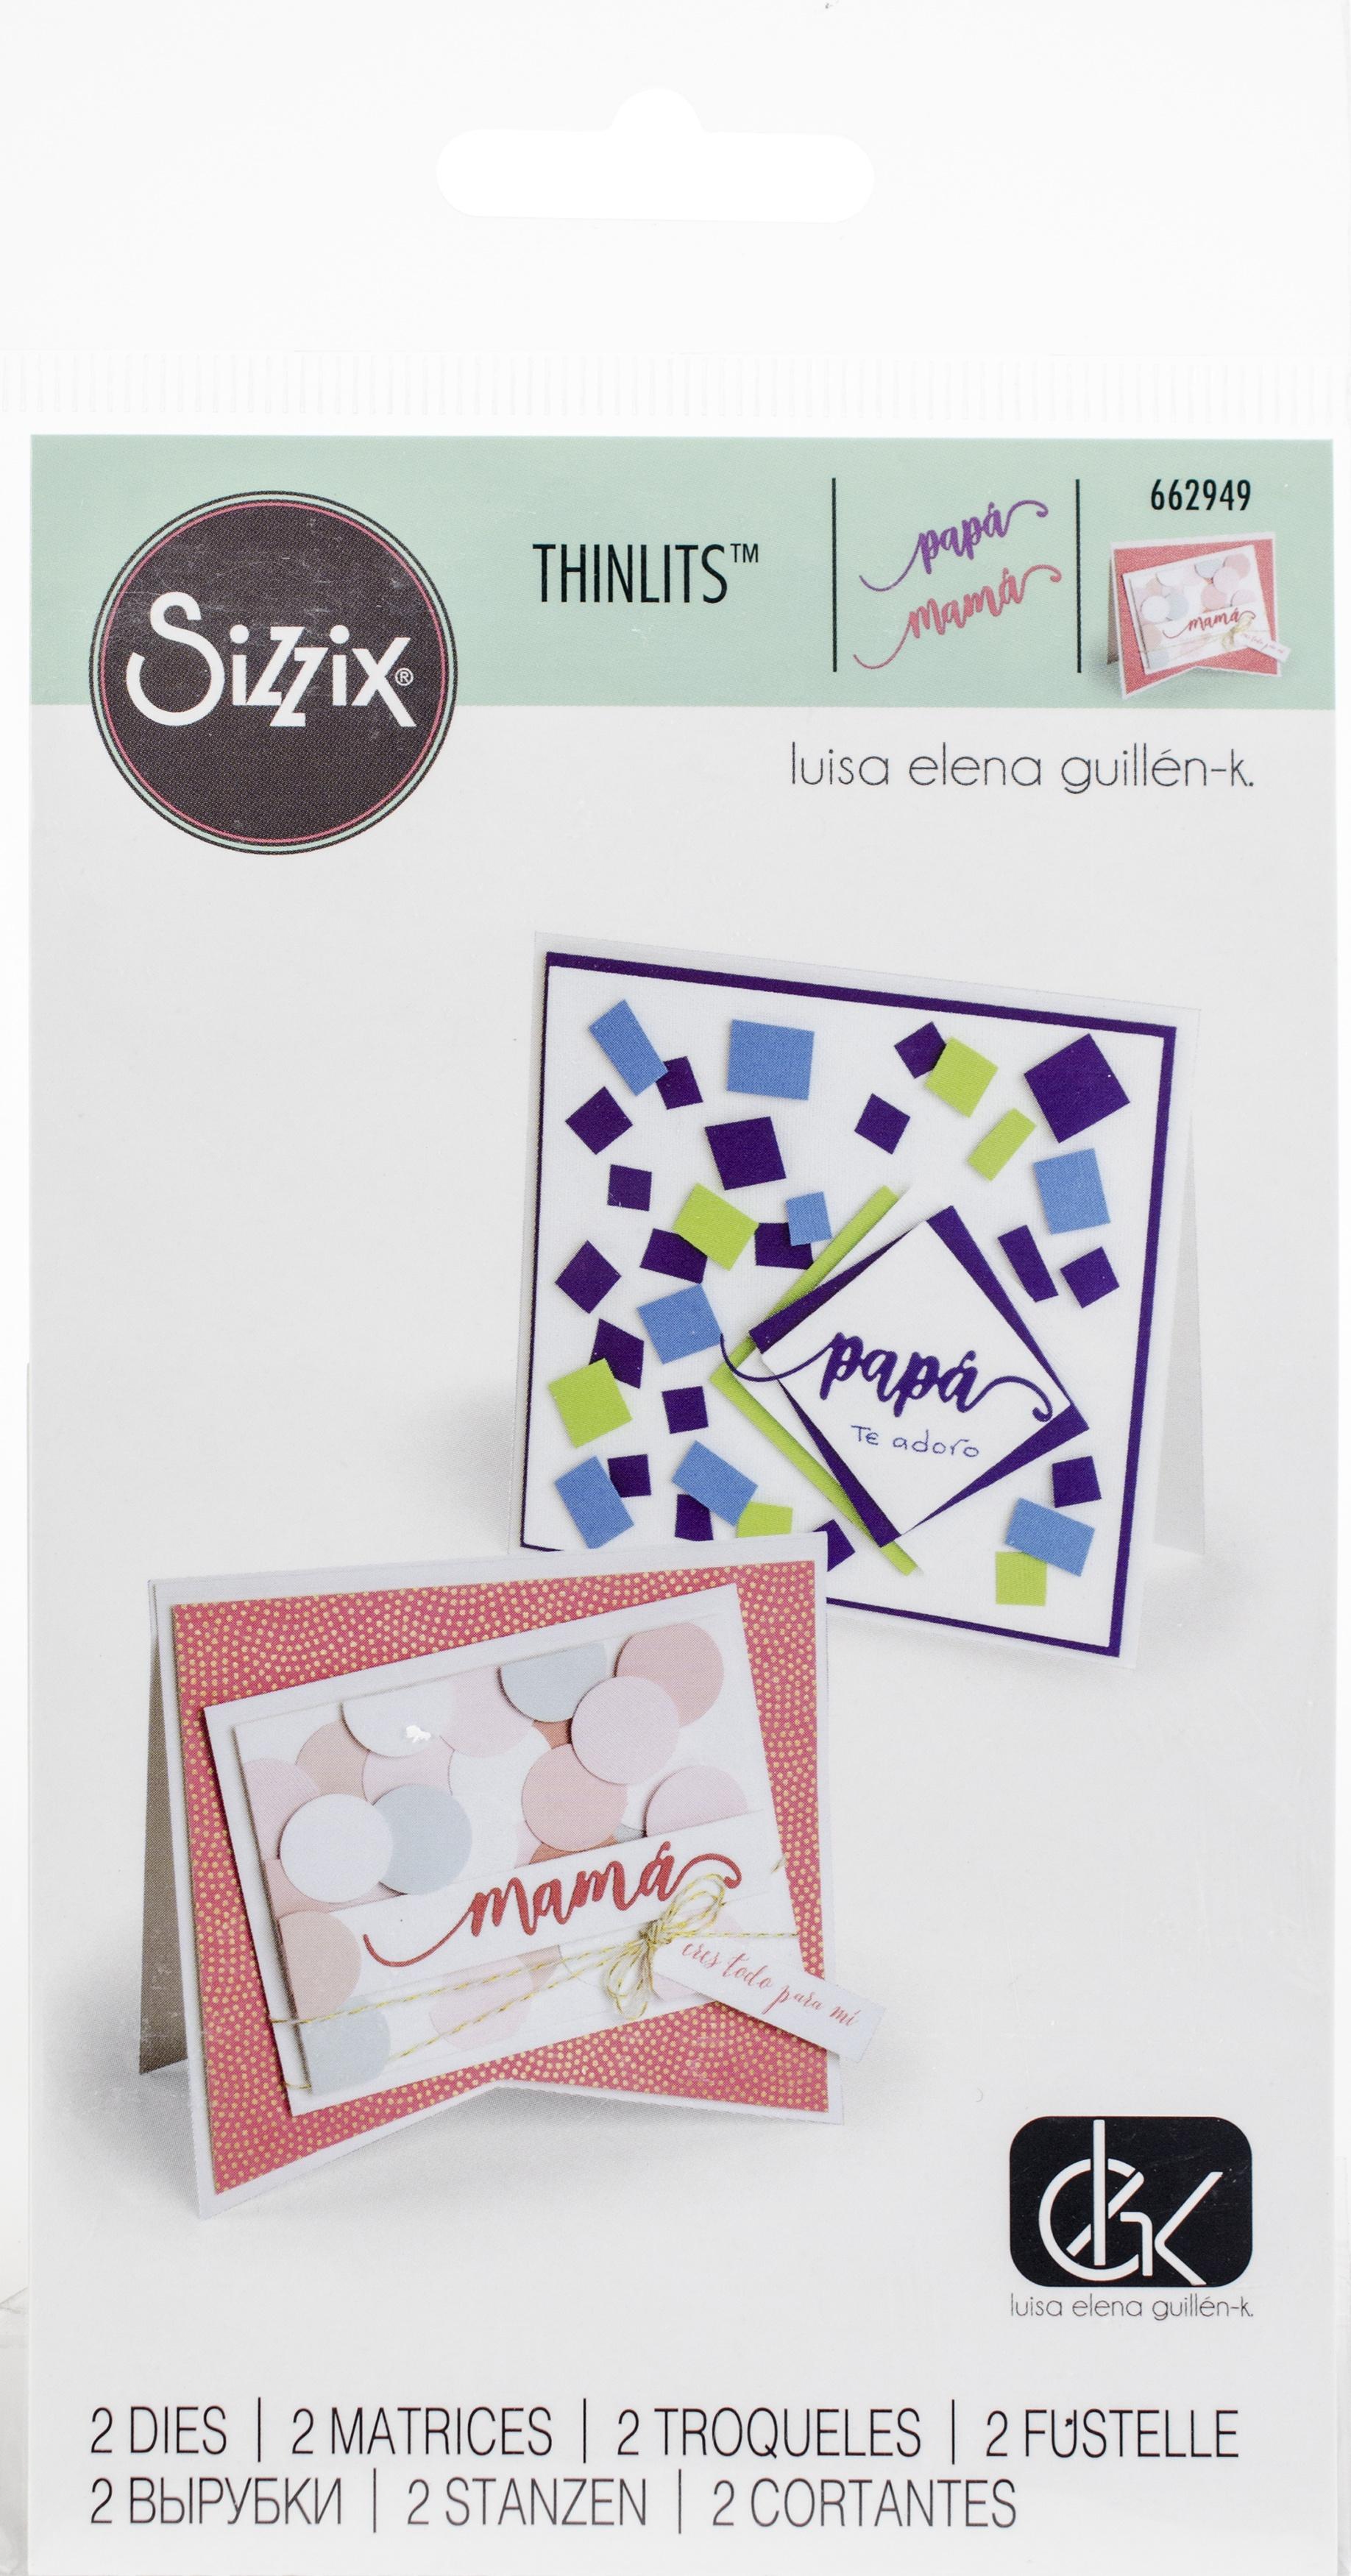 Sizzix Thinlits Dies By Luisa Elena Guillen-Papa y Mama (Dad & Mom)